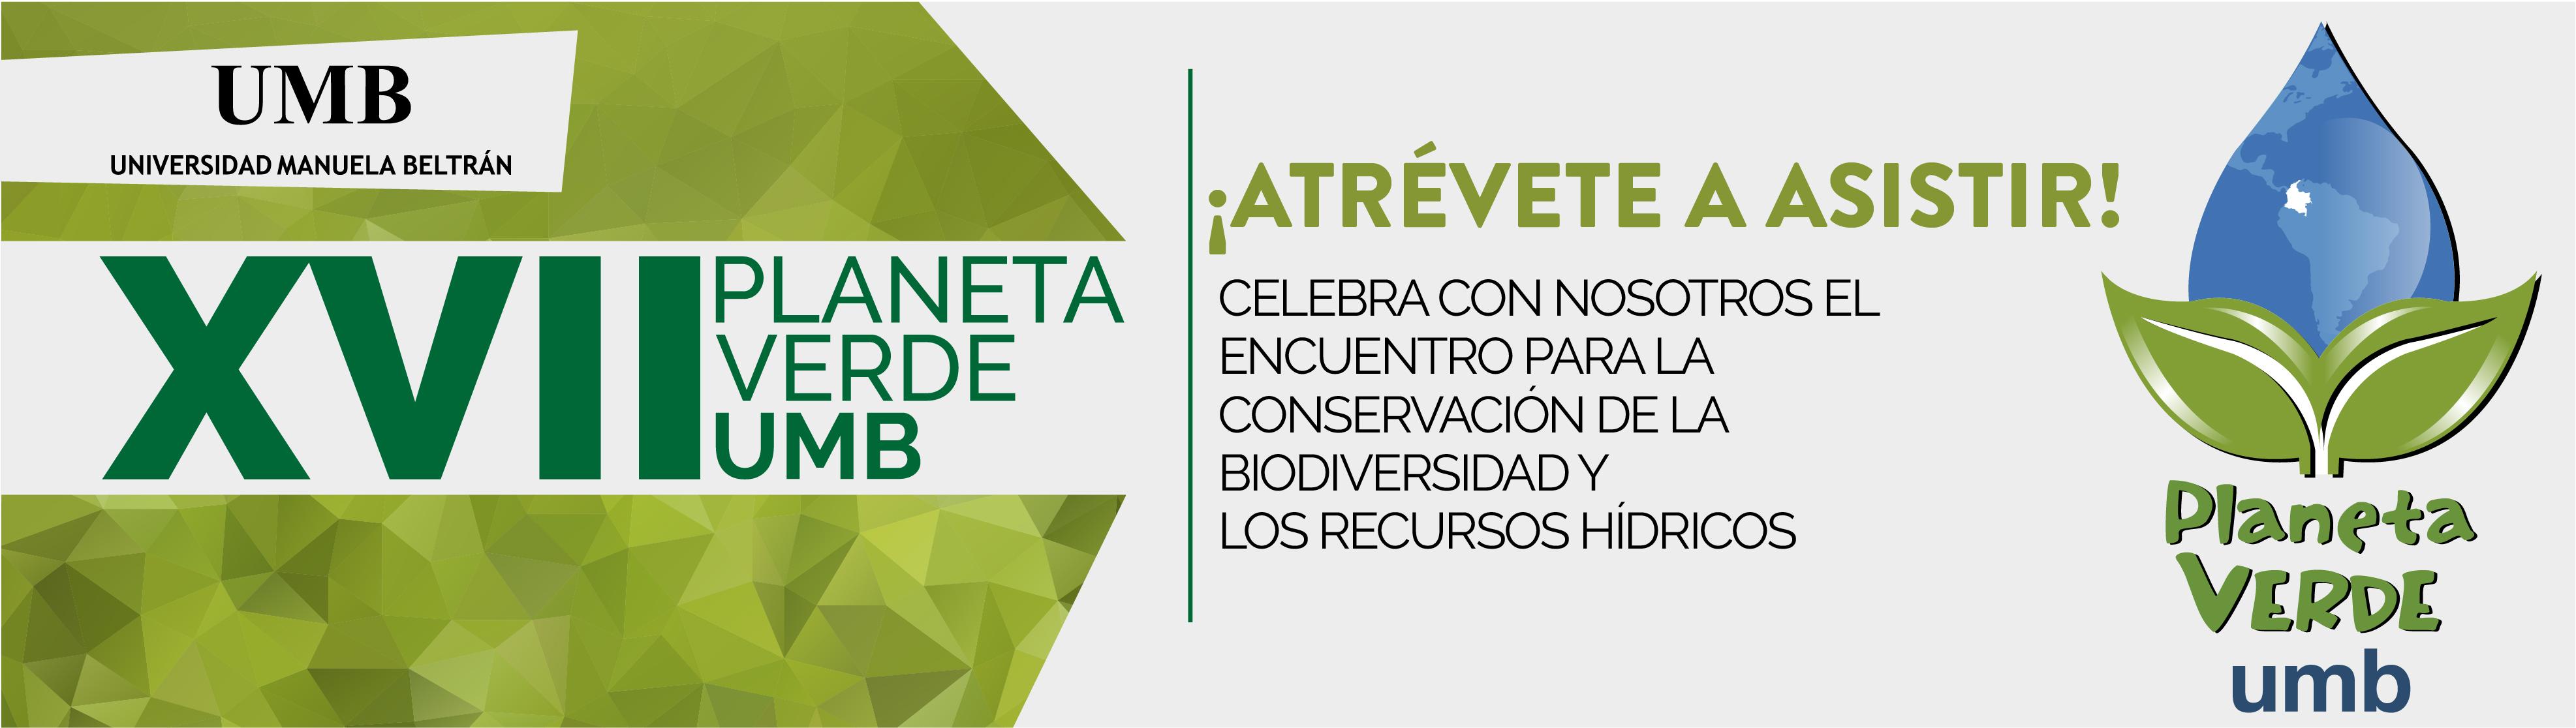 Banner_registro_planeta_verde